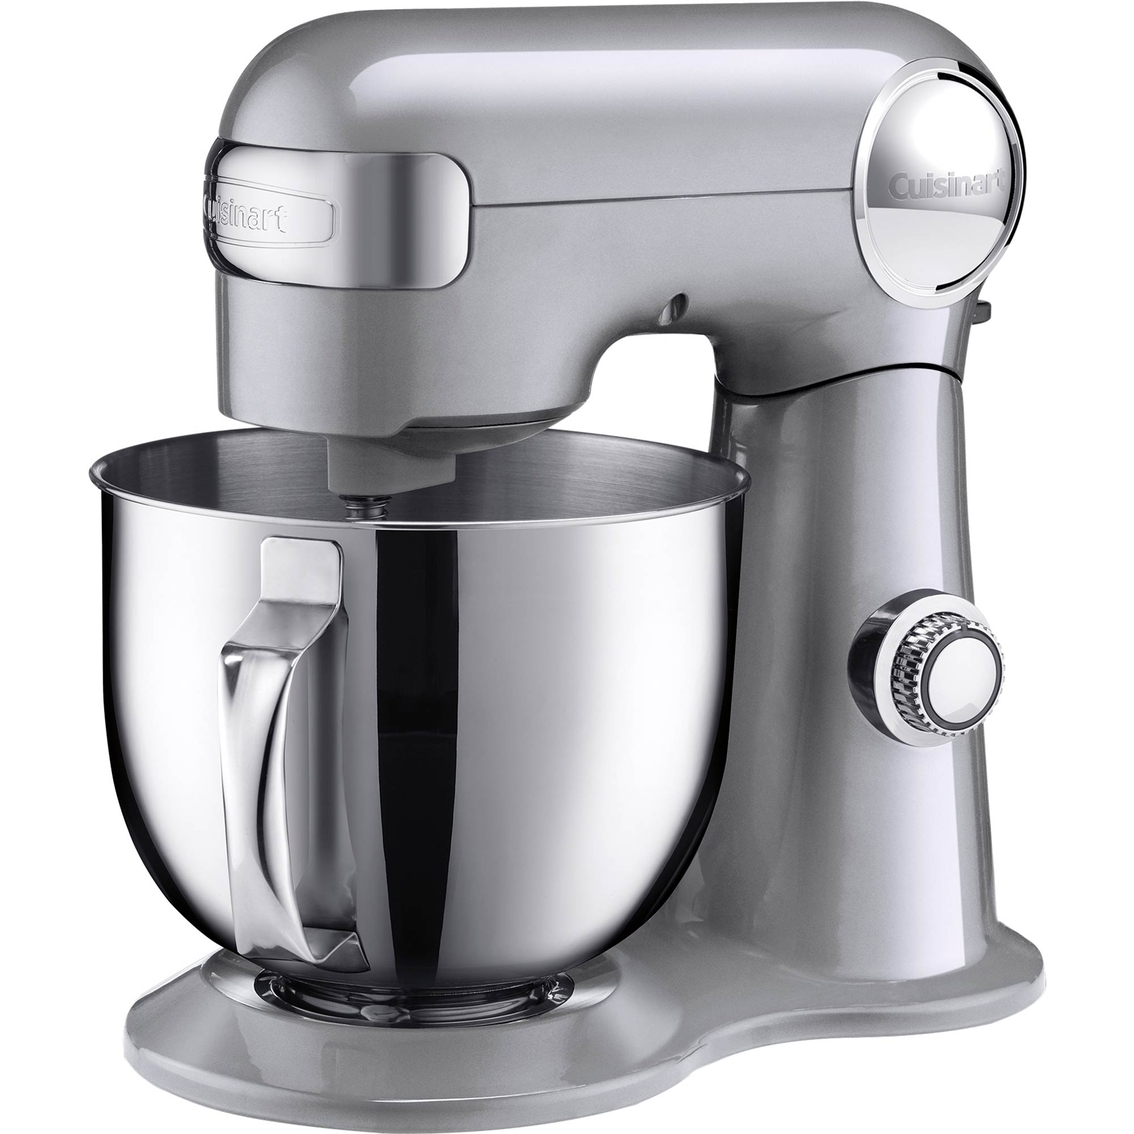 Cuisinart 5.5 Quart Stand Mixer | Stand Mixers | Home & Appliances ...